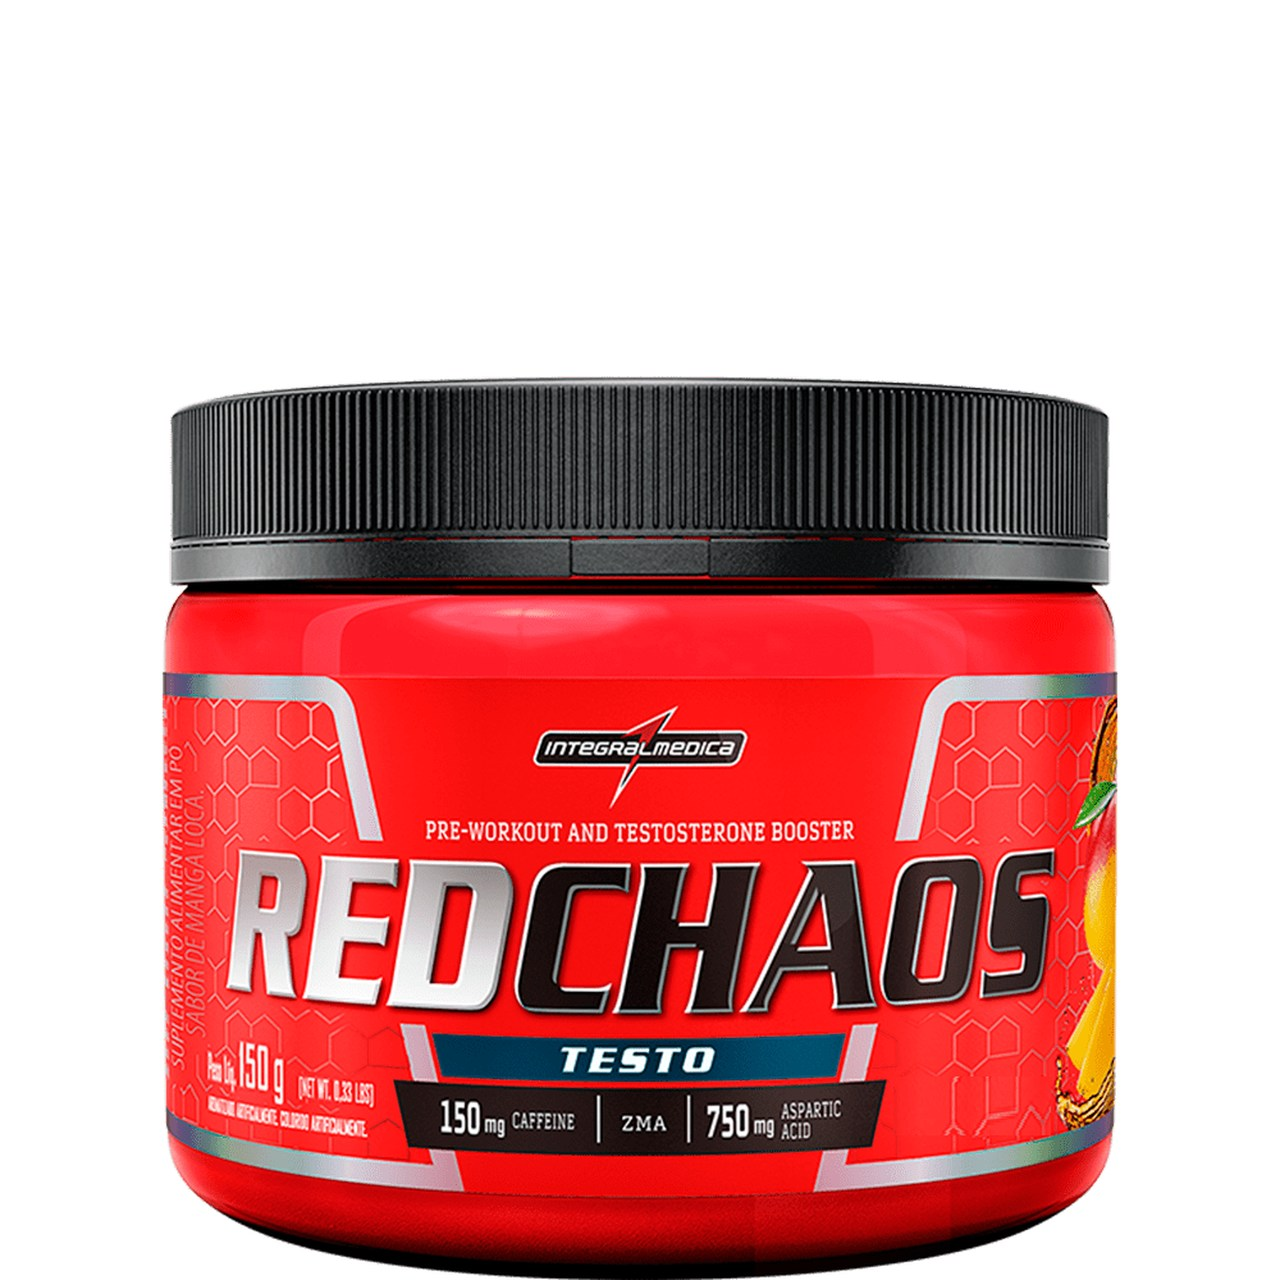 RED CHAOS TESTO PRÉ TREINO 150G - INTEGRALMEDICA